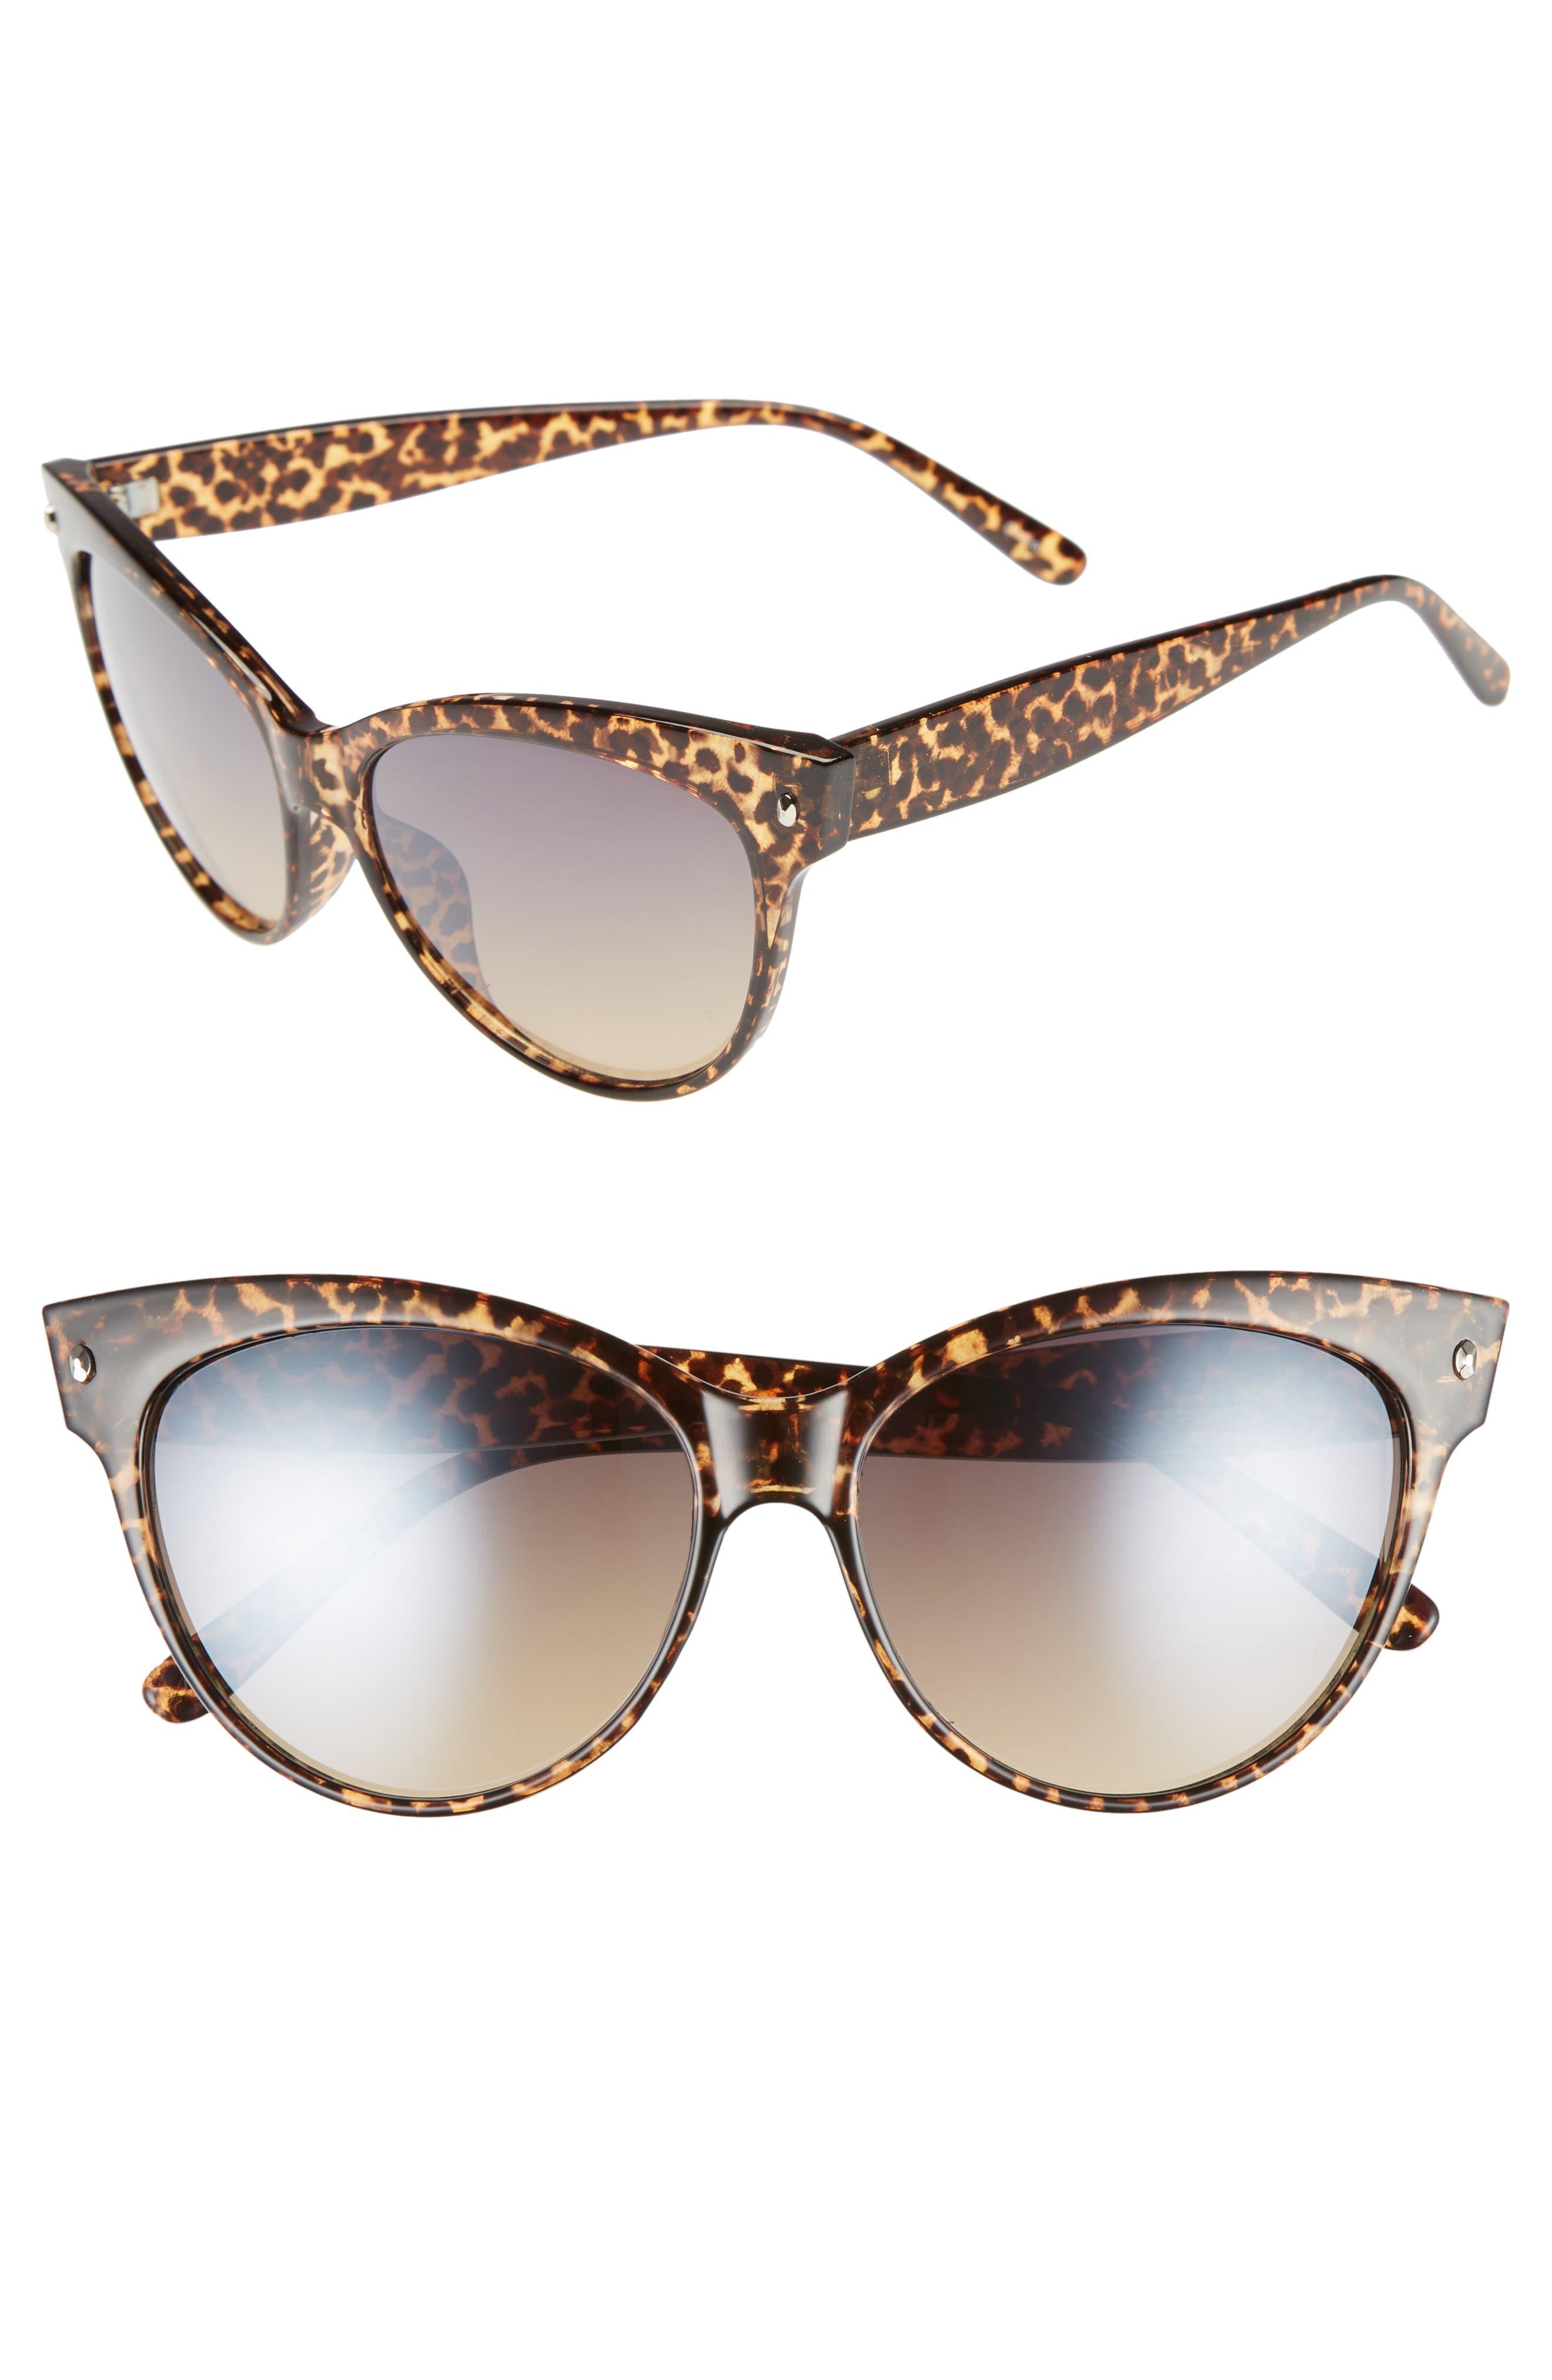 56mm Print Cat Eye Sunglasses,                             Main thumbnail 1, color,                             Leopard/ Brown